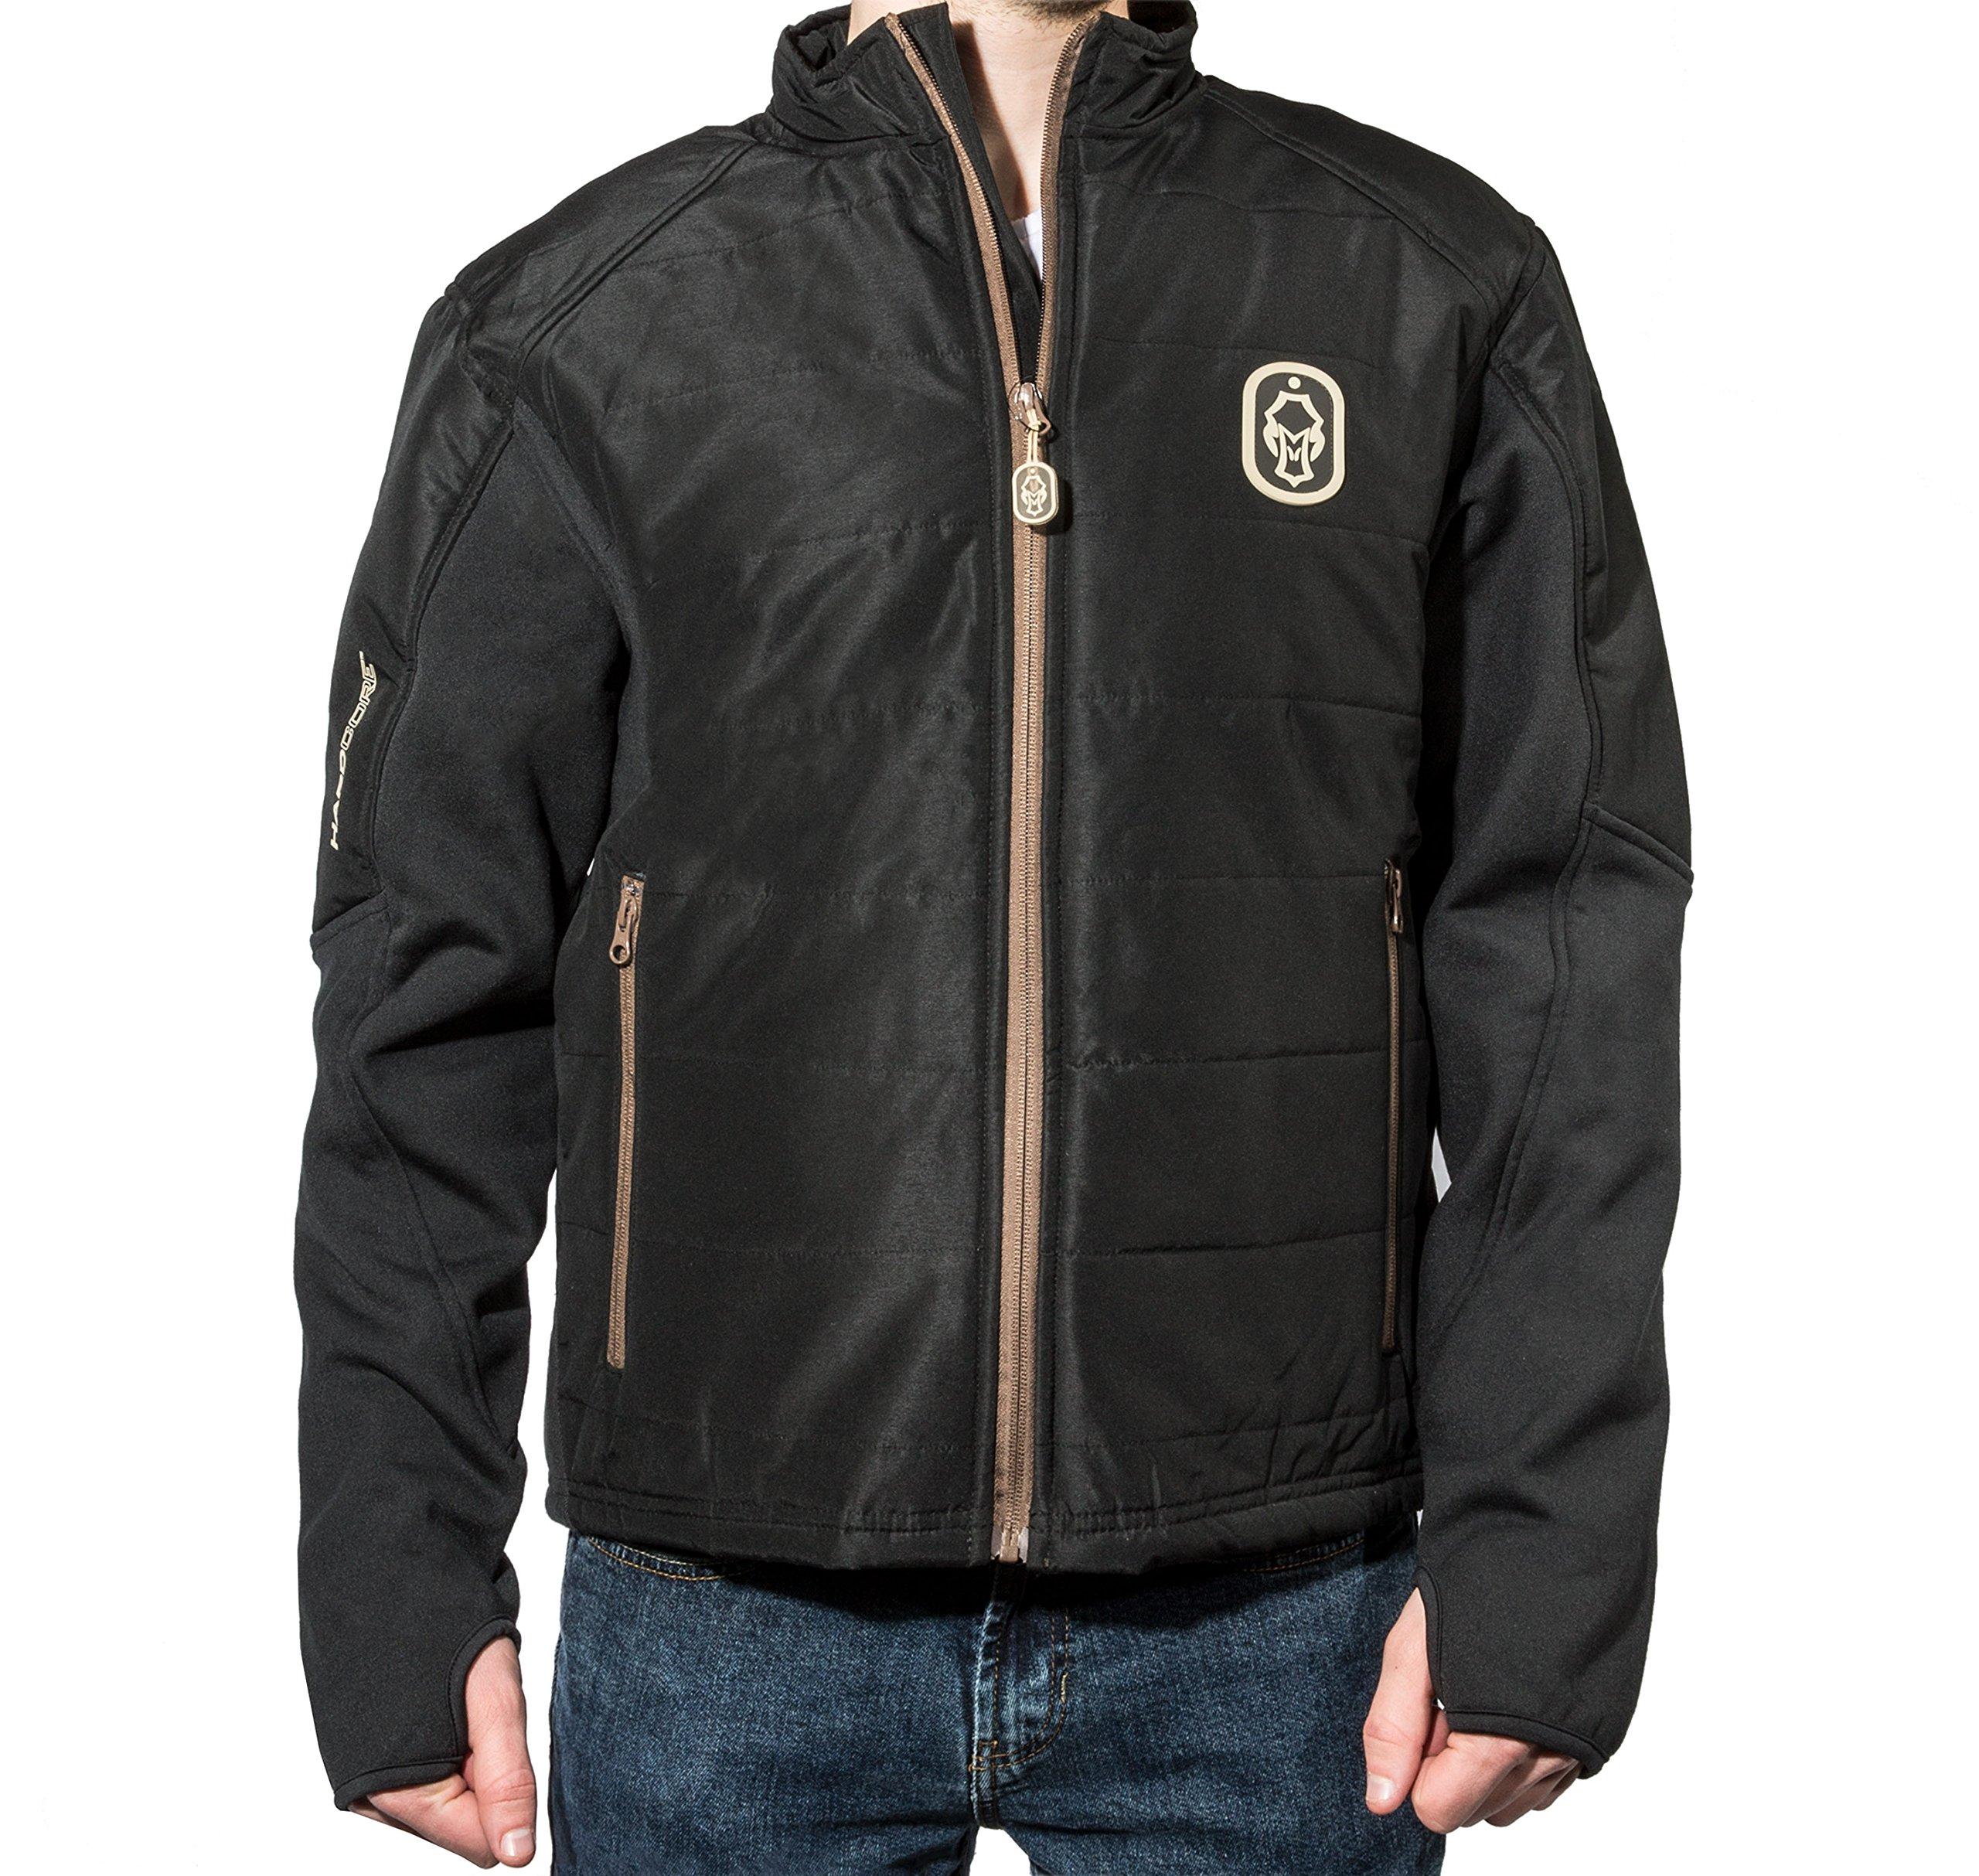 Hard Core Brands Finisher Hybrid Puff Jacket (Black, XX-Large) by Scent-Lok (Image #1)